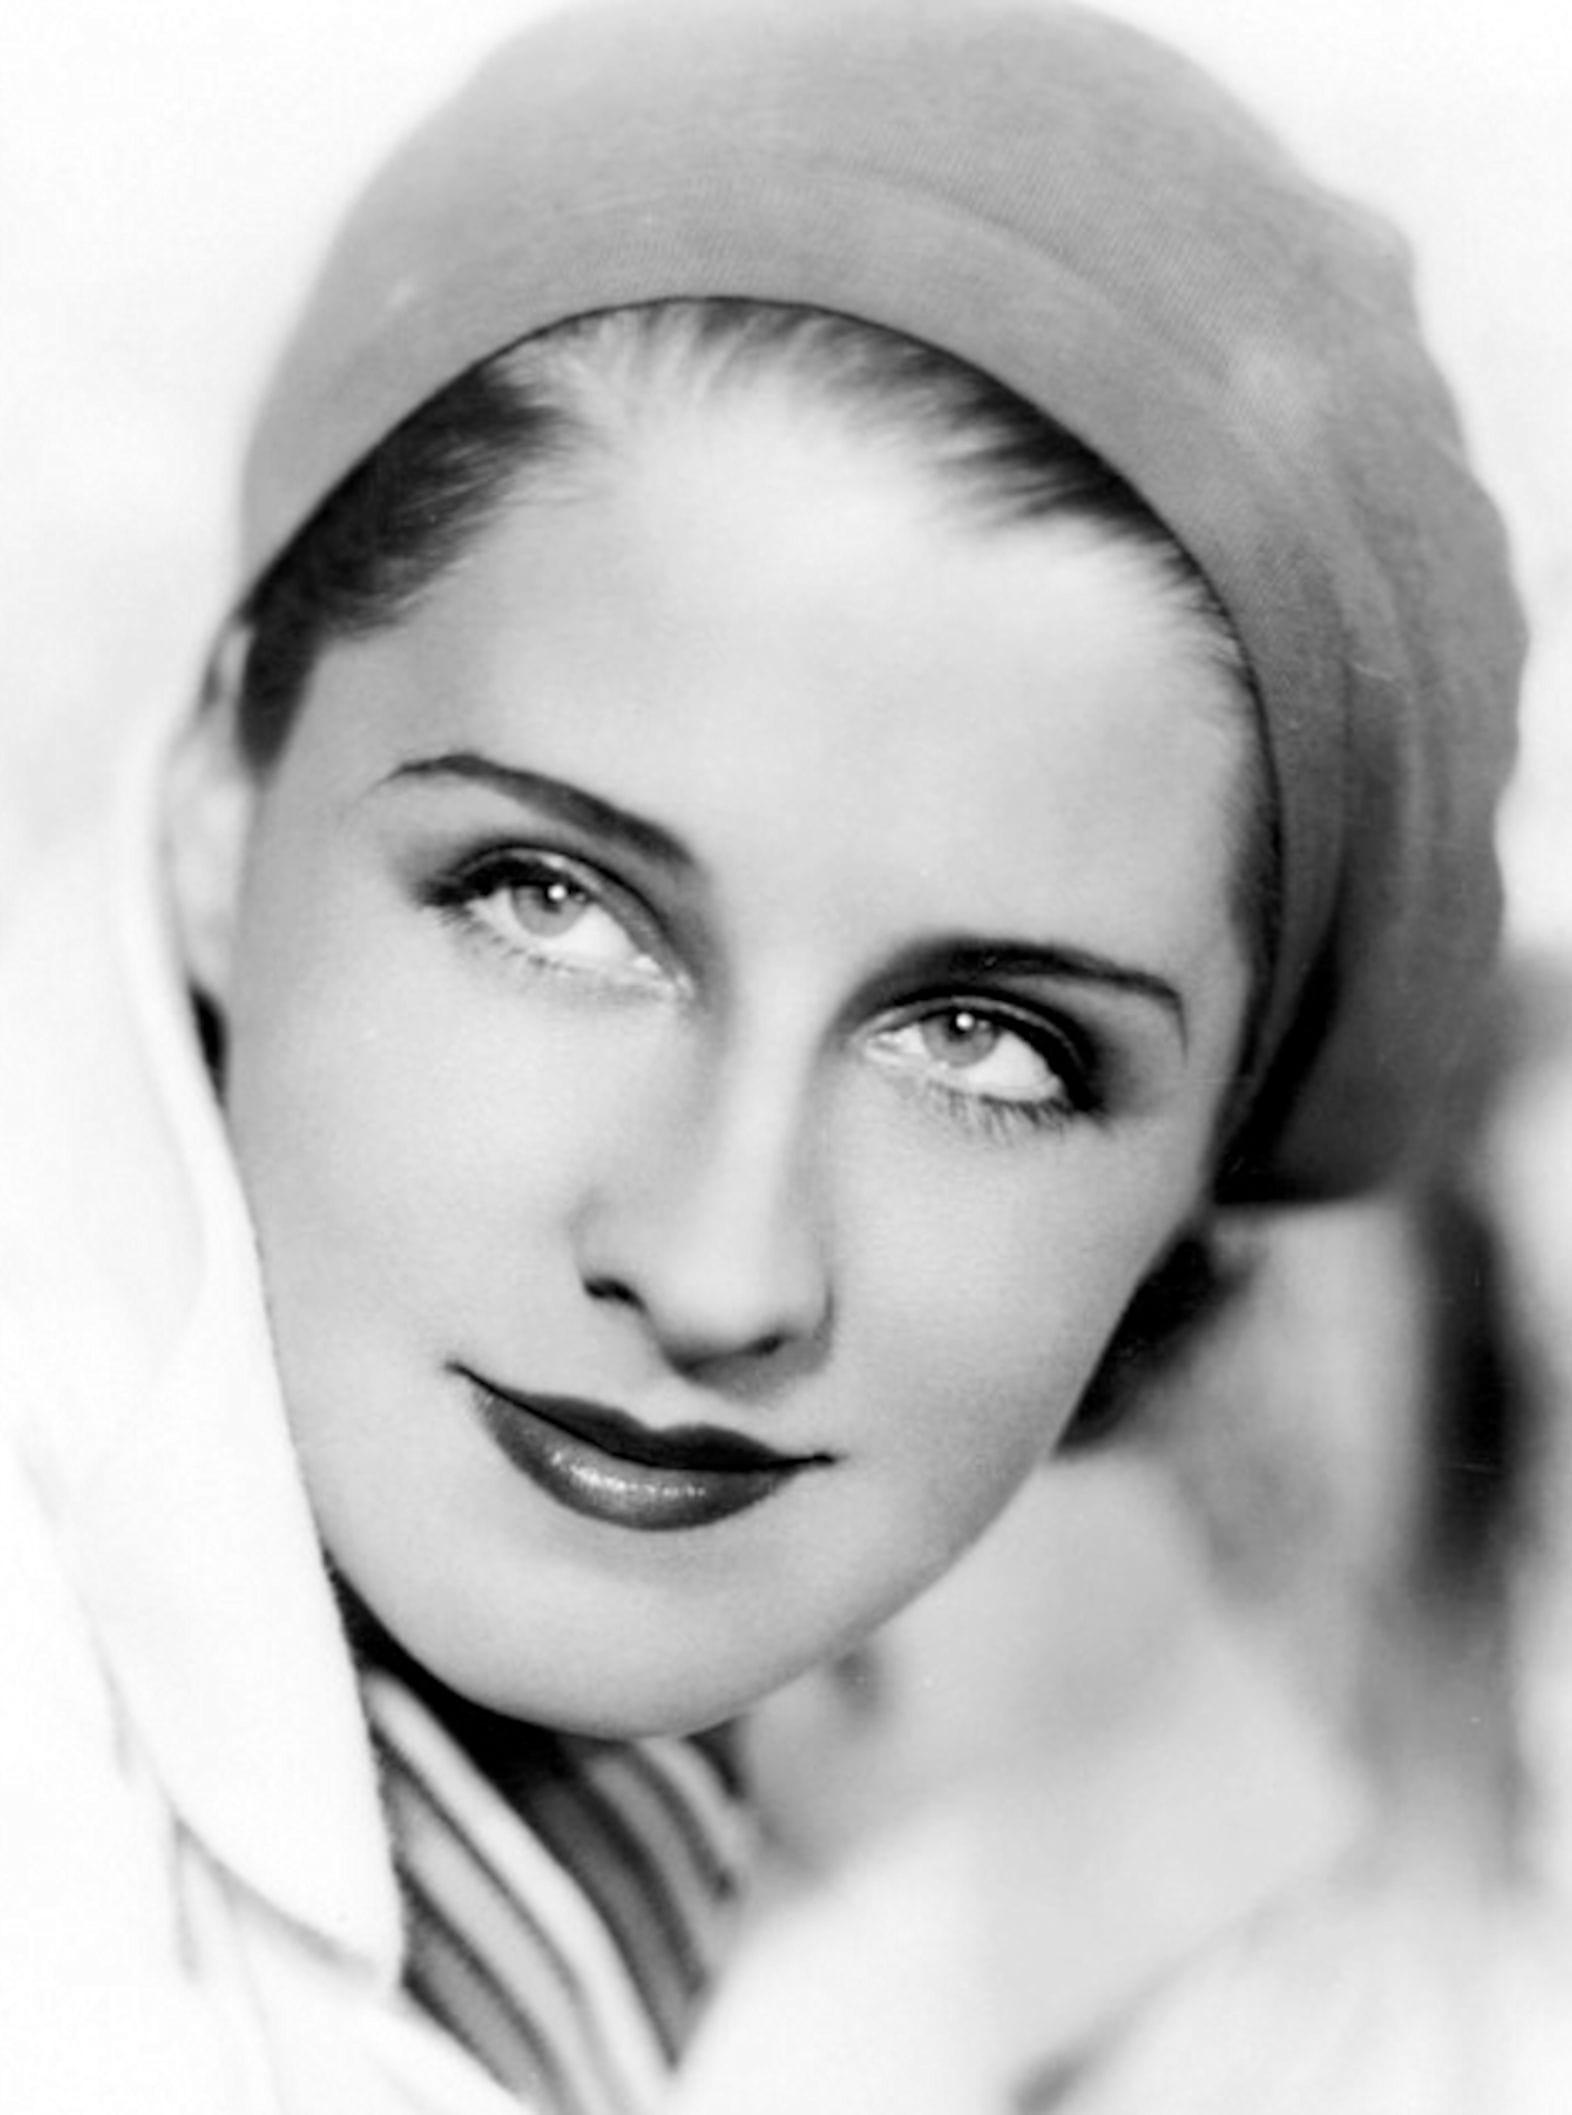 Norma Shearer For mobile